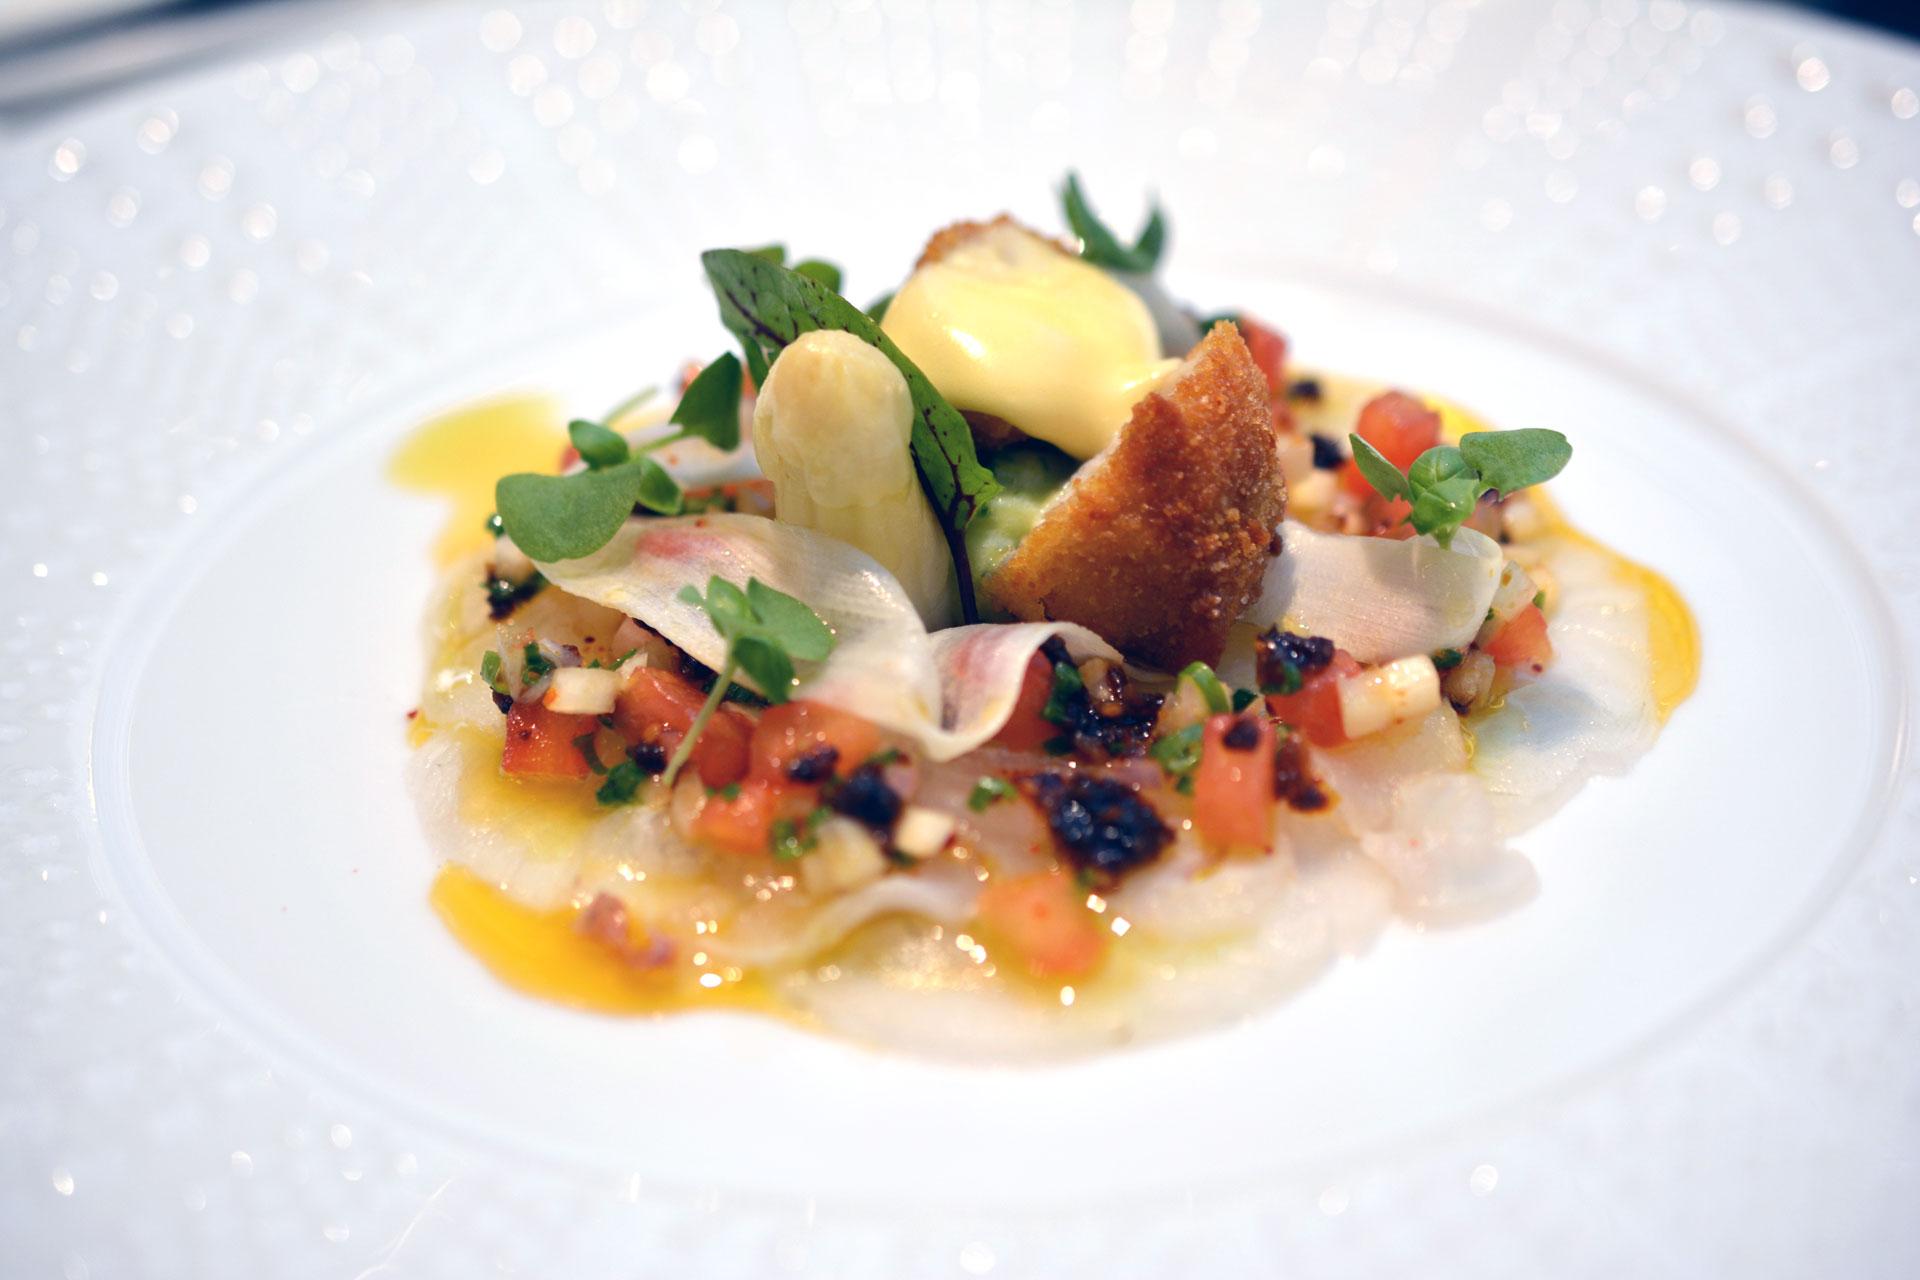 Zander Carpaccio, Tomaten Spargel Vinaigrette, Kalbsbries, Bärlauch Mayonnaise